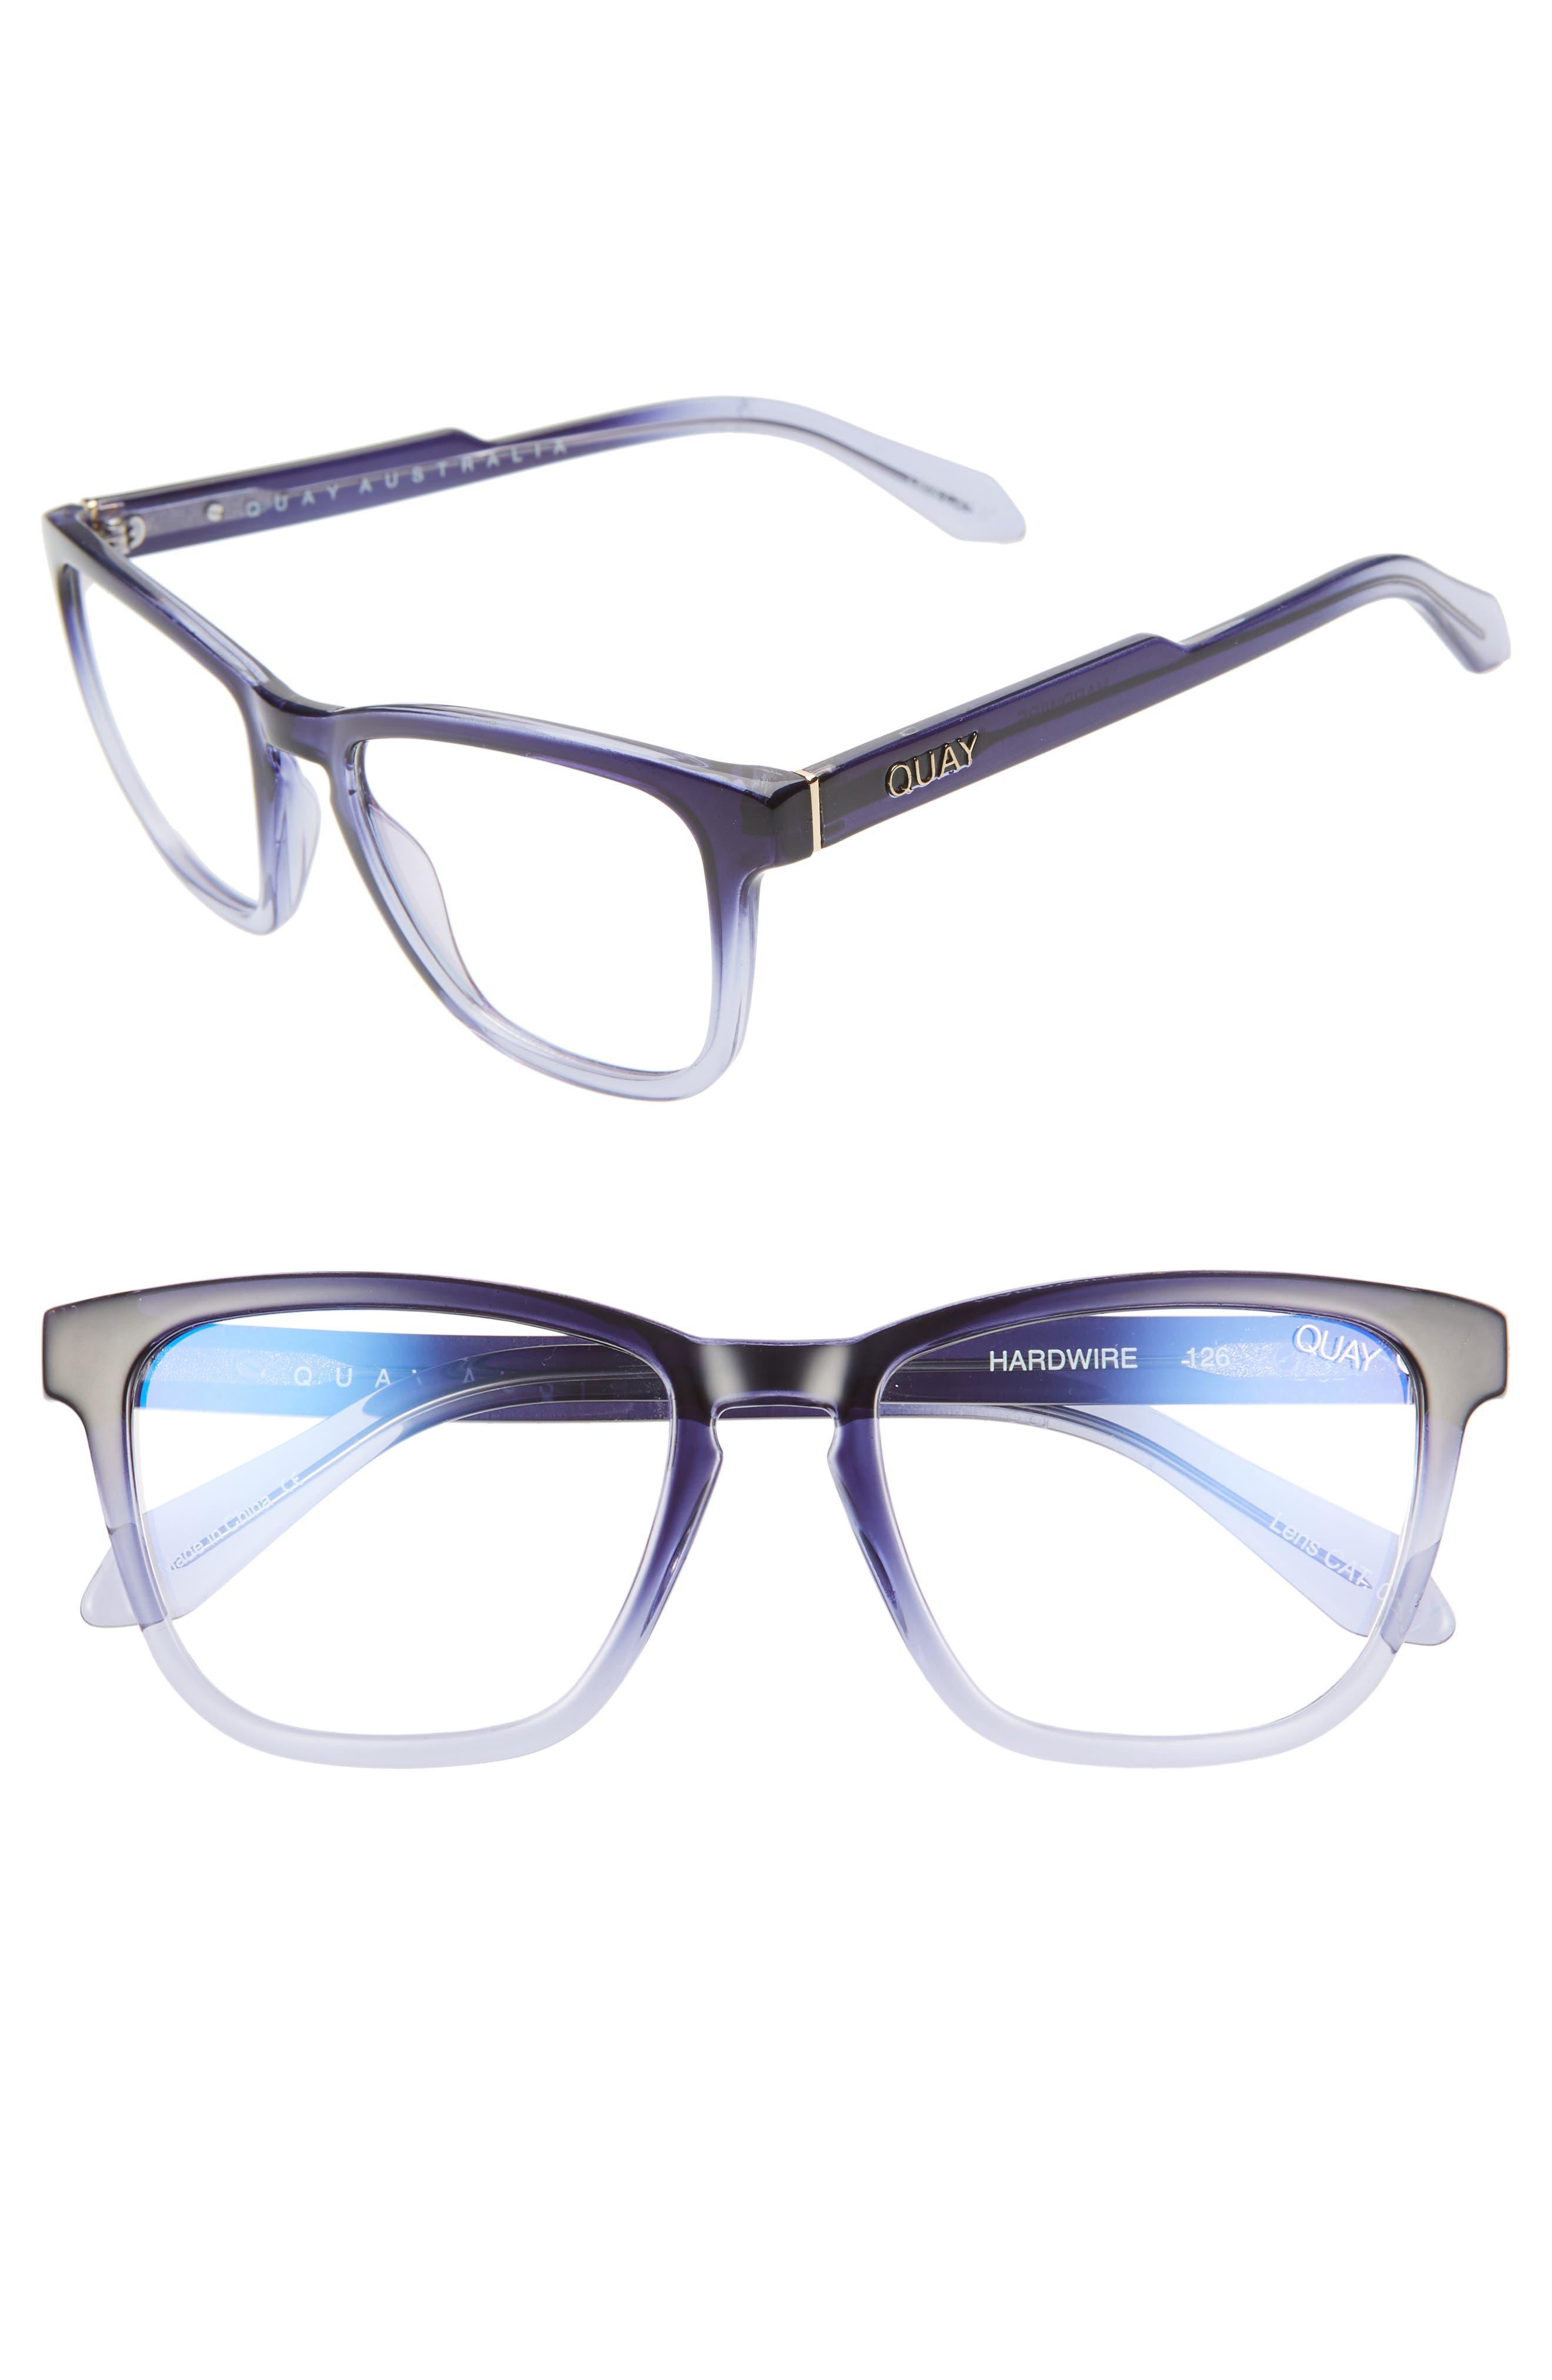 Quay Glasses HARDWIRE 54MM BLUE LIGHT BLOCKING GLASSES - NAVY FADE